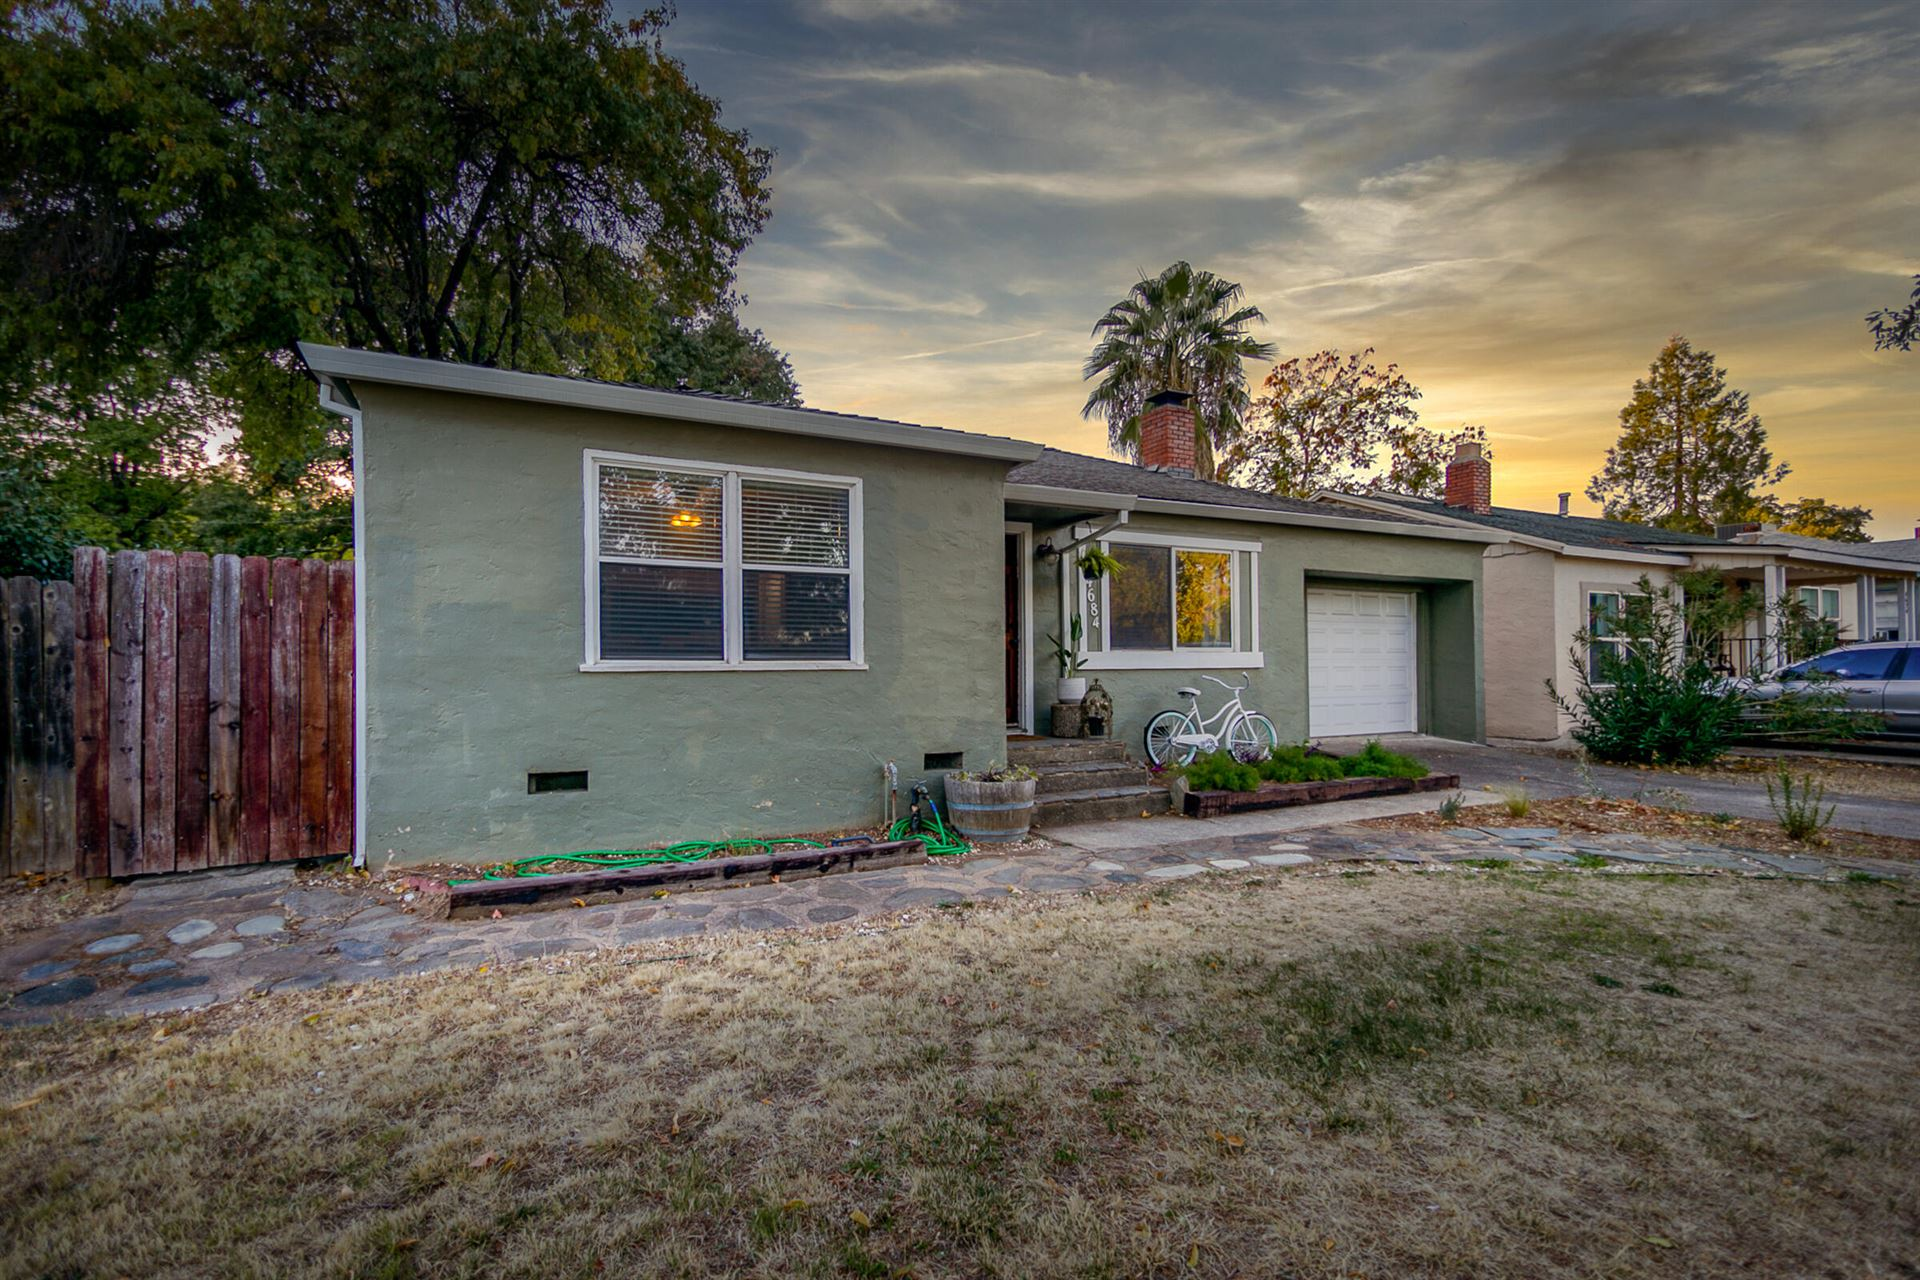 Photo of 4684 Harrison Ave, Redding, CA 96001 (MLS # 21-4889)